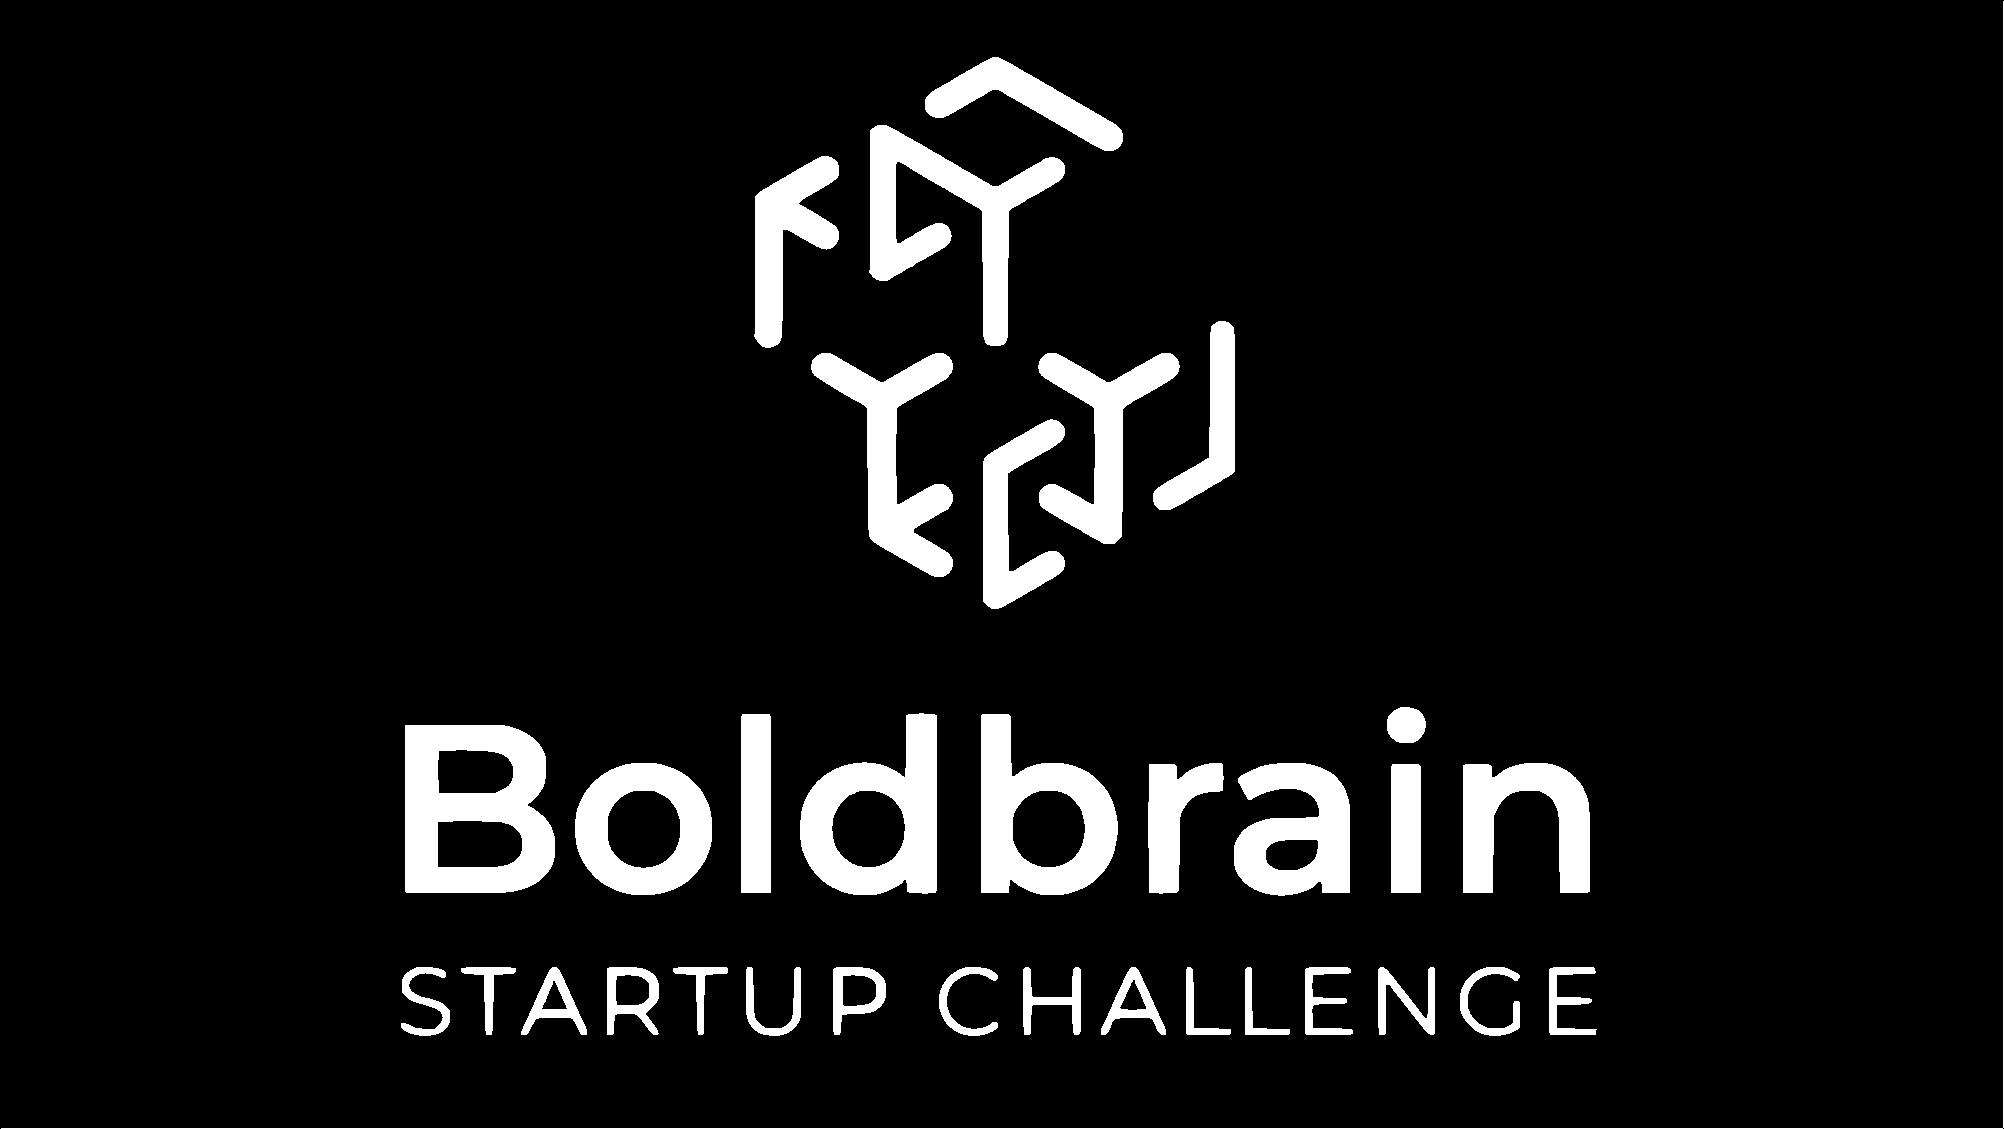 boldbrain_logo_white